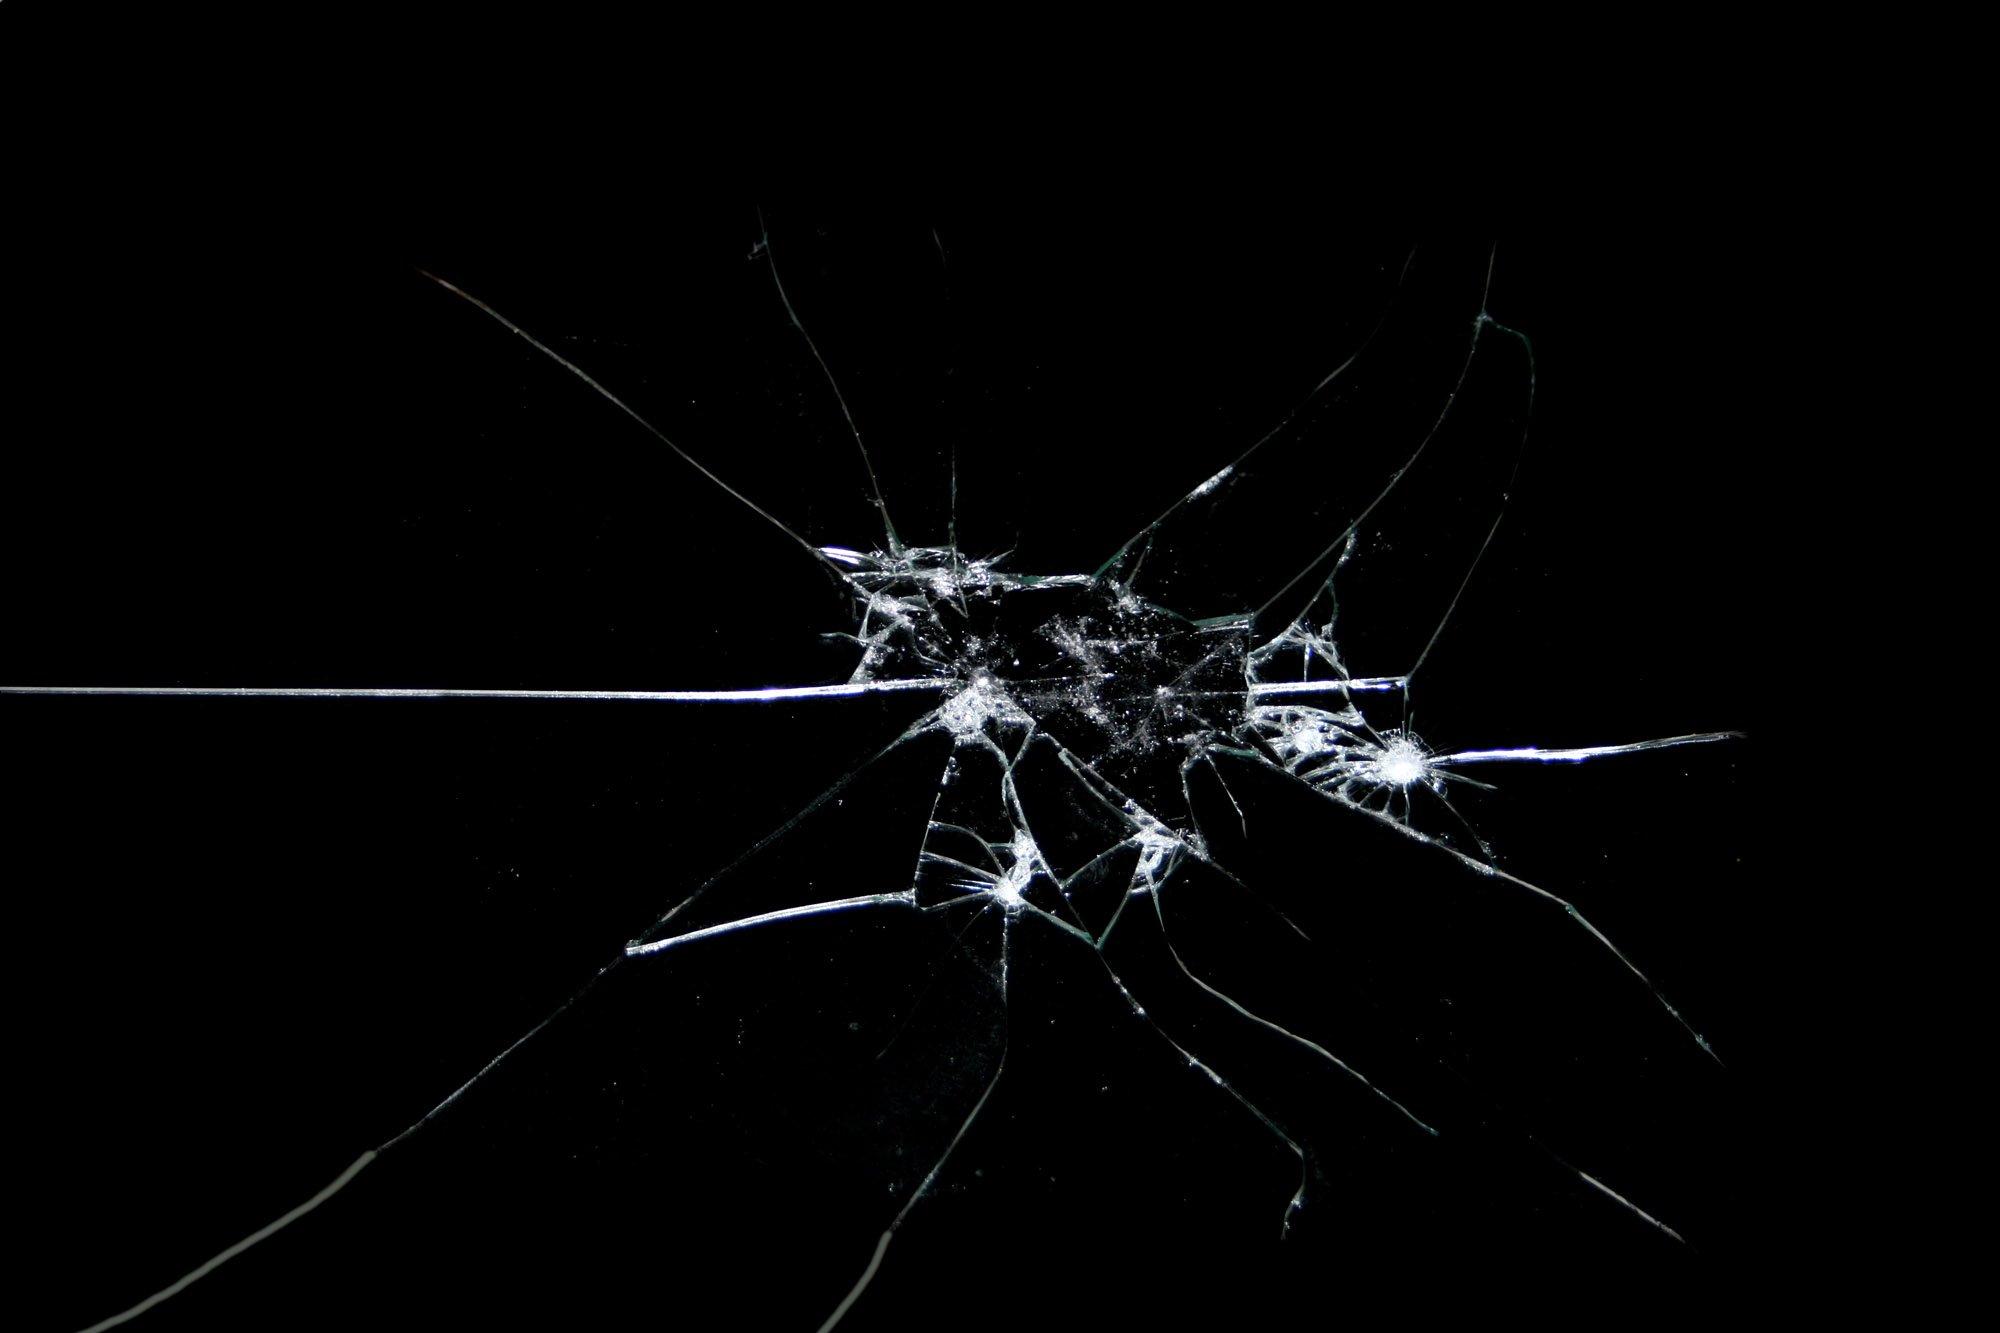 Cracked Glass Wallpaper Iphone yourdownloadworldnet 2000x1333